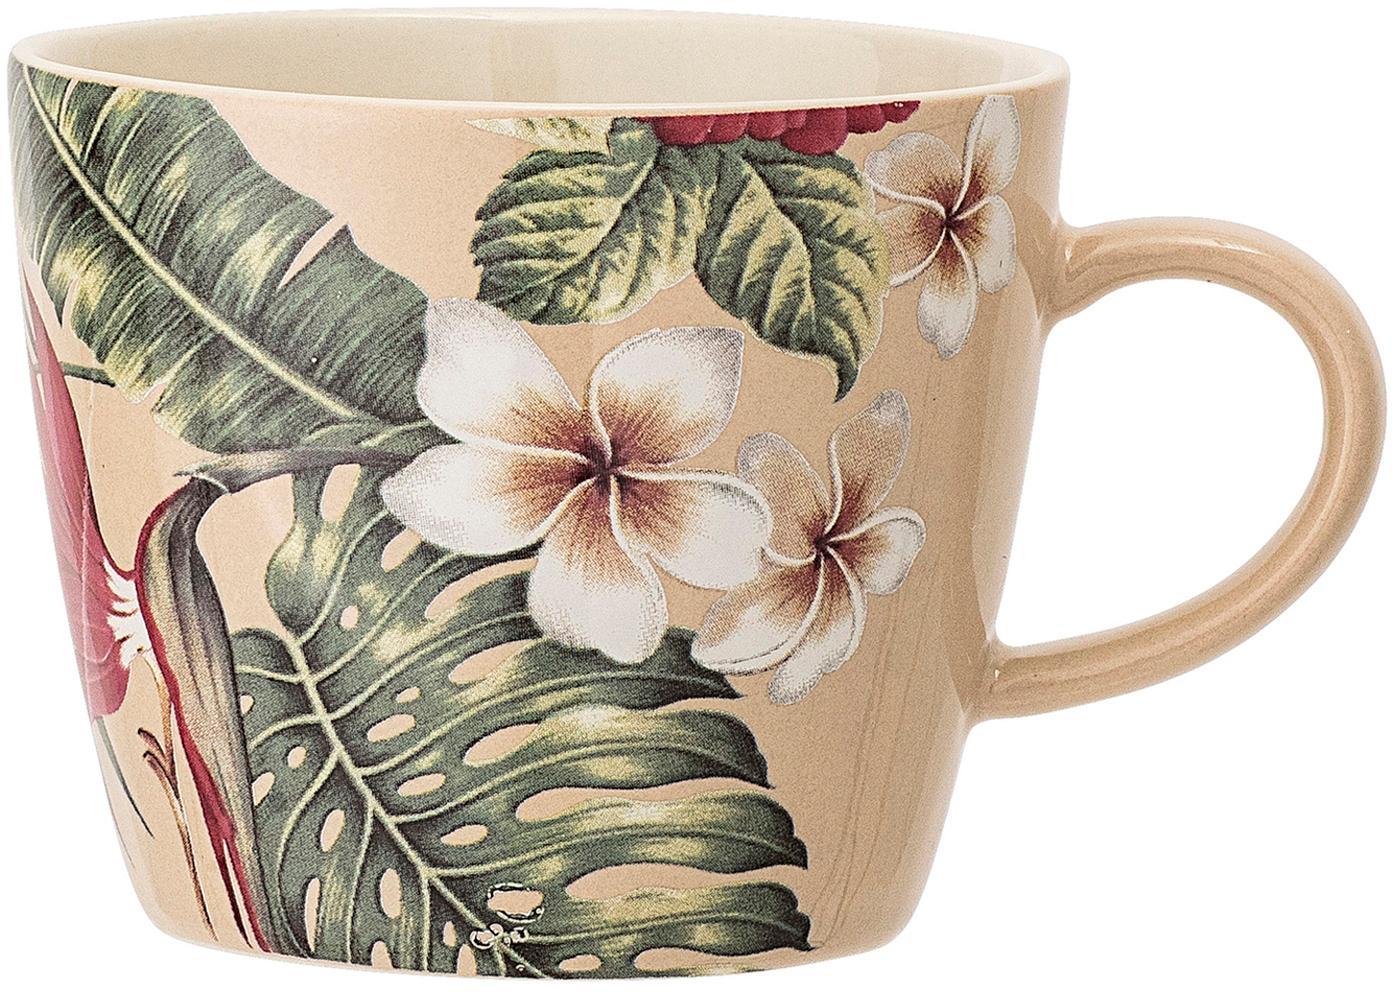 Kaffeetassen Aruba mit tropischem Motiv, 2 Stück, Steingut, Cremeweiss, Grün, Rot, Ø 10 x H 8 cm